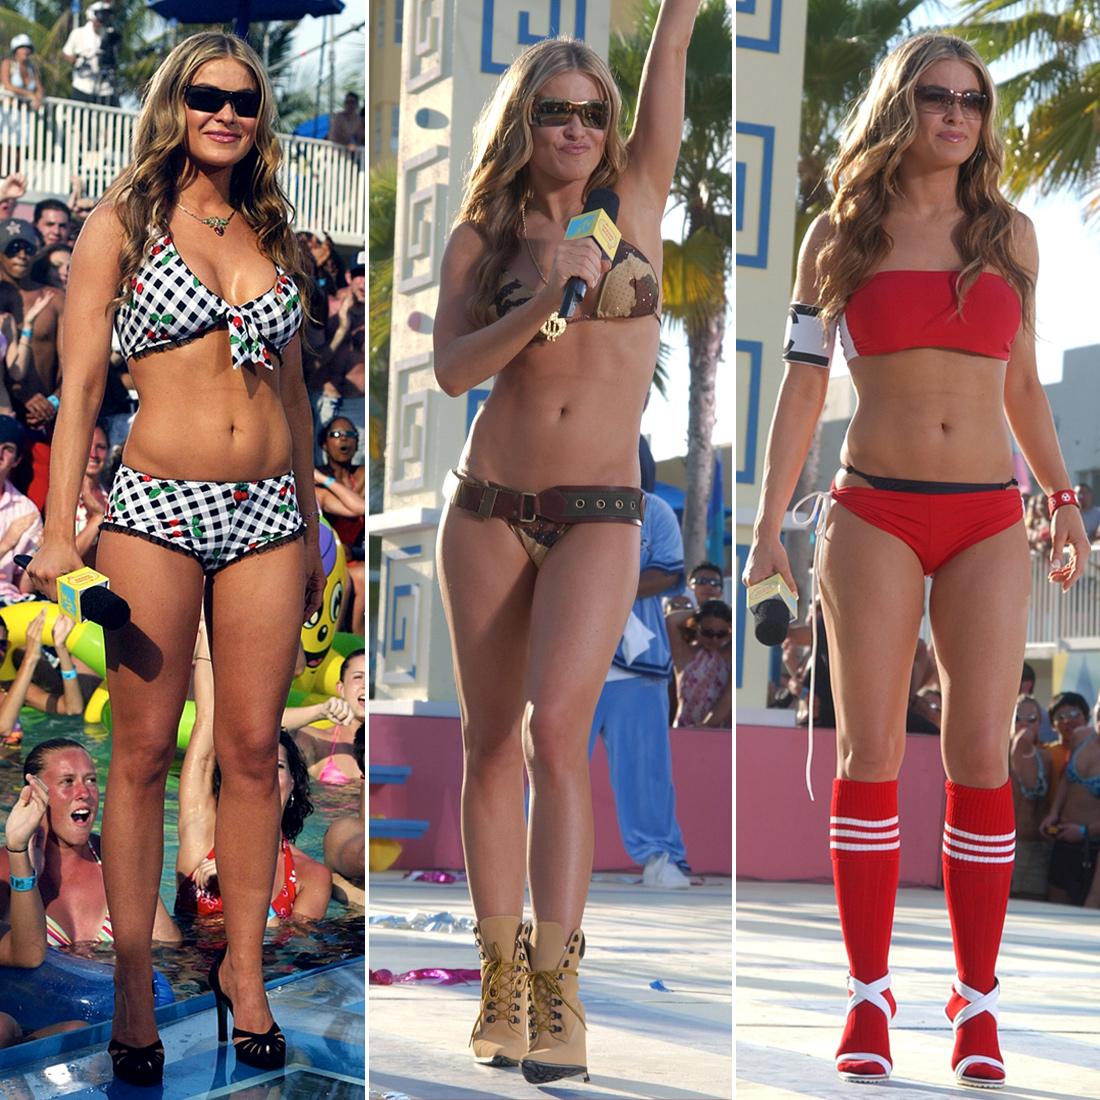 2003: Carmen Electra wears no fewer than 10 bikinis during her hosting gig in Miami.